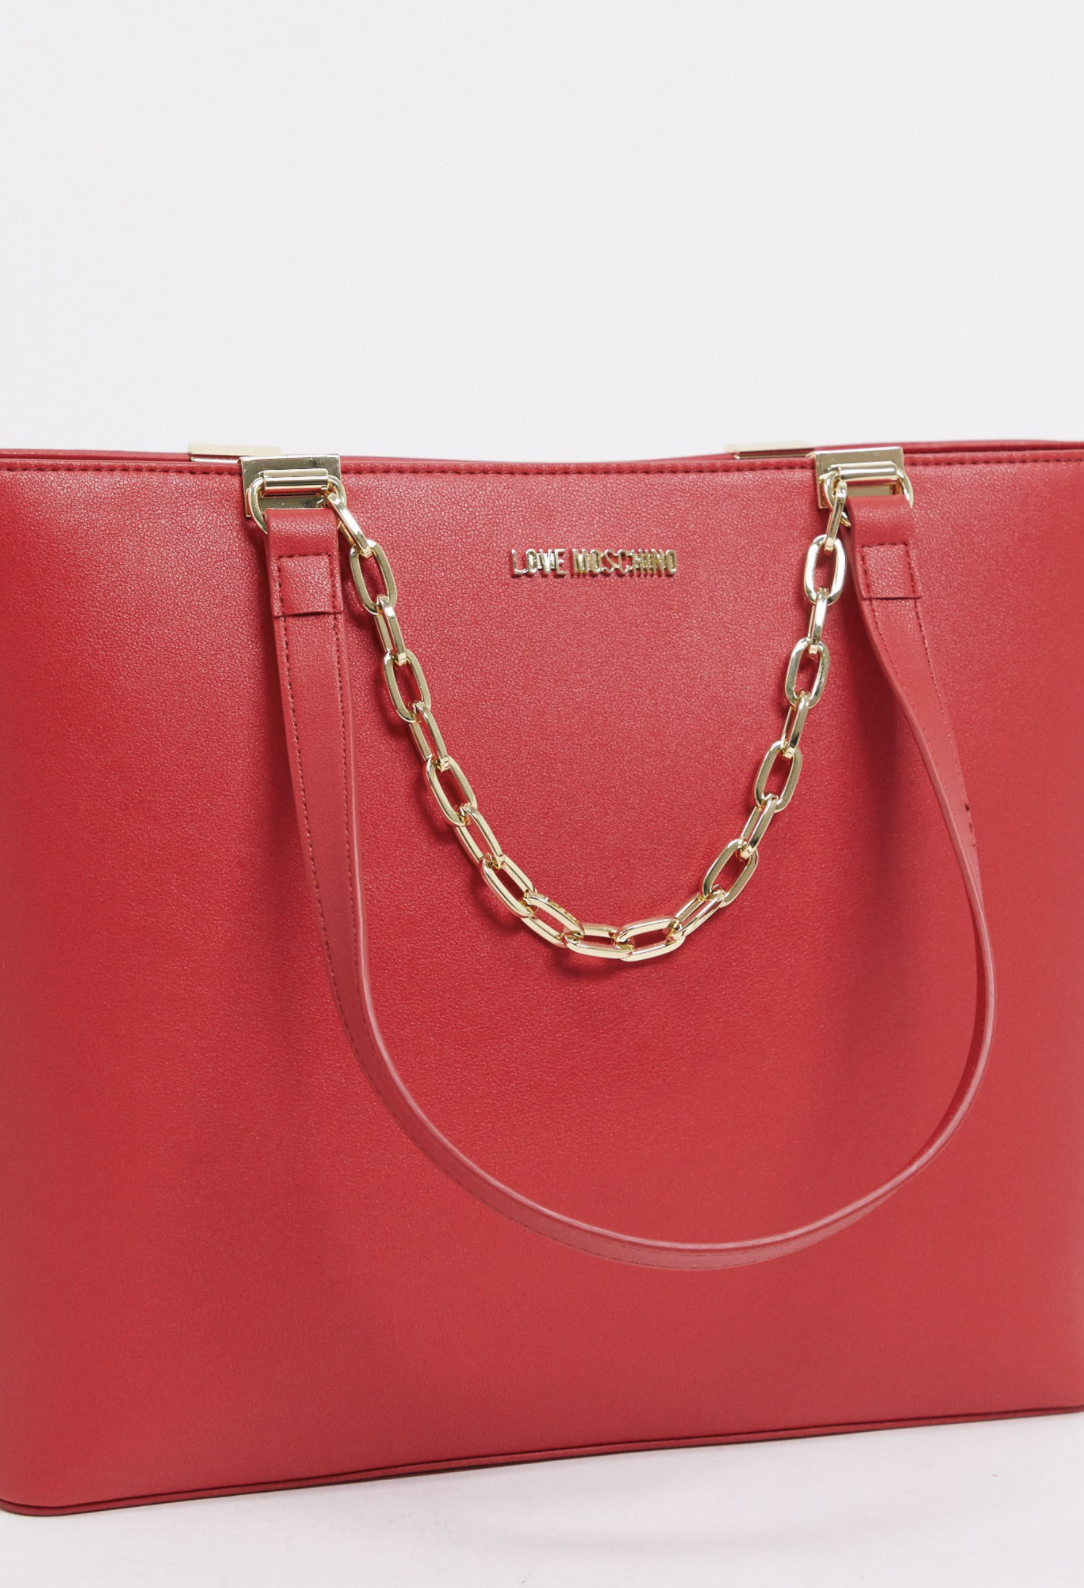 Bolso tote grande rojo con cadena de Love Moschino